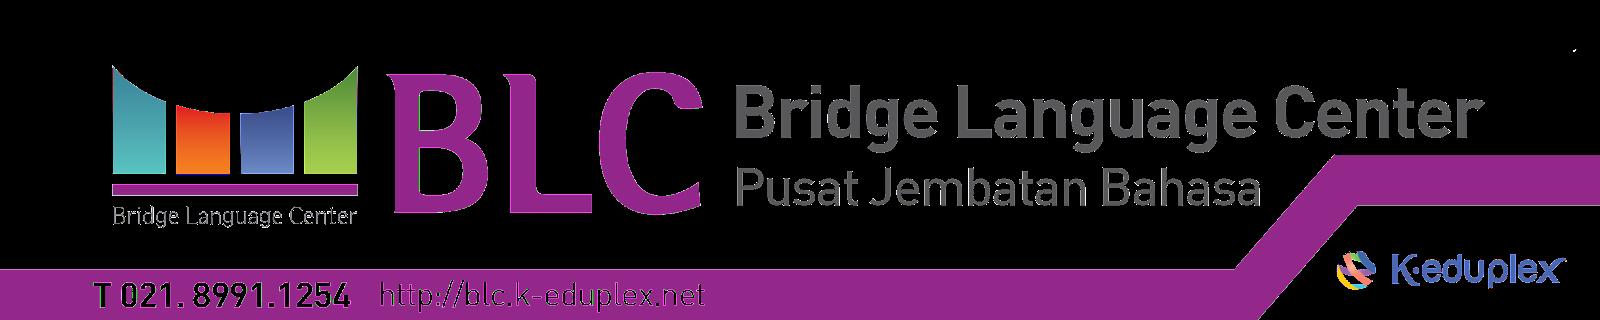 Welcome to Bridge Language Center!